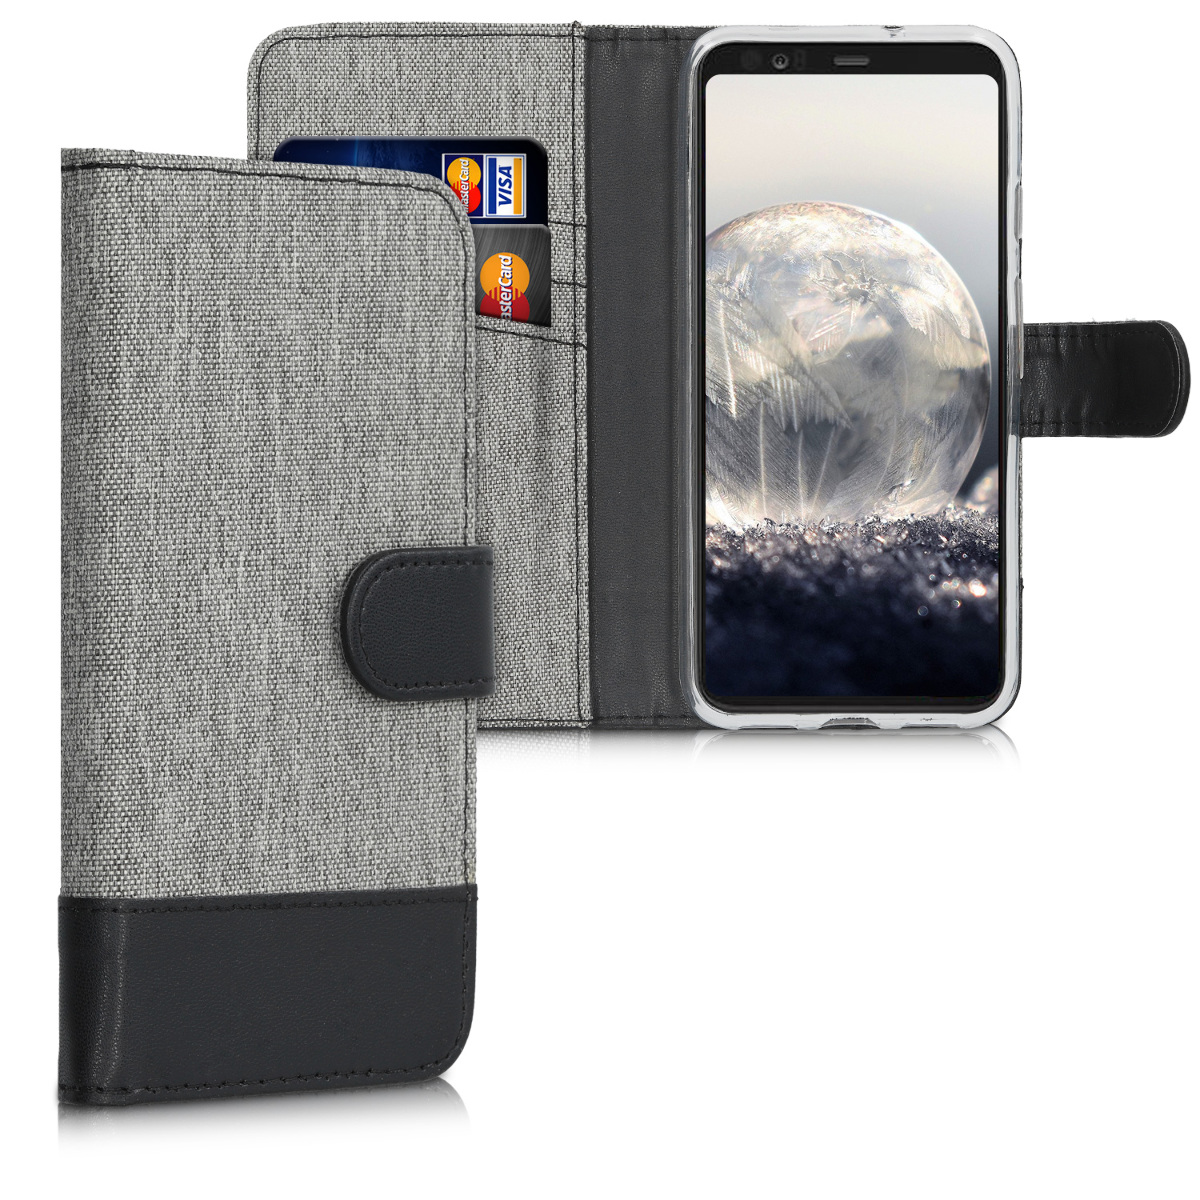 KW Θήκη Πορτοφόλι Google Pixel 4 - Grey / Black (50375.22)